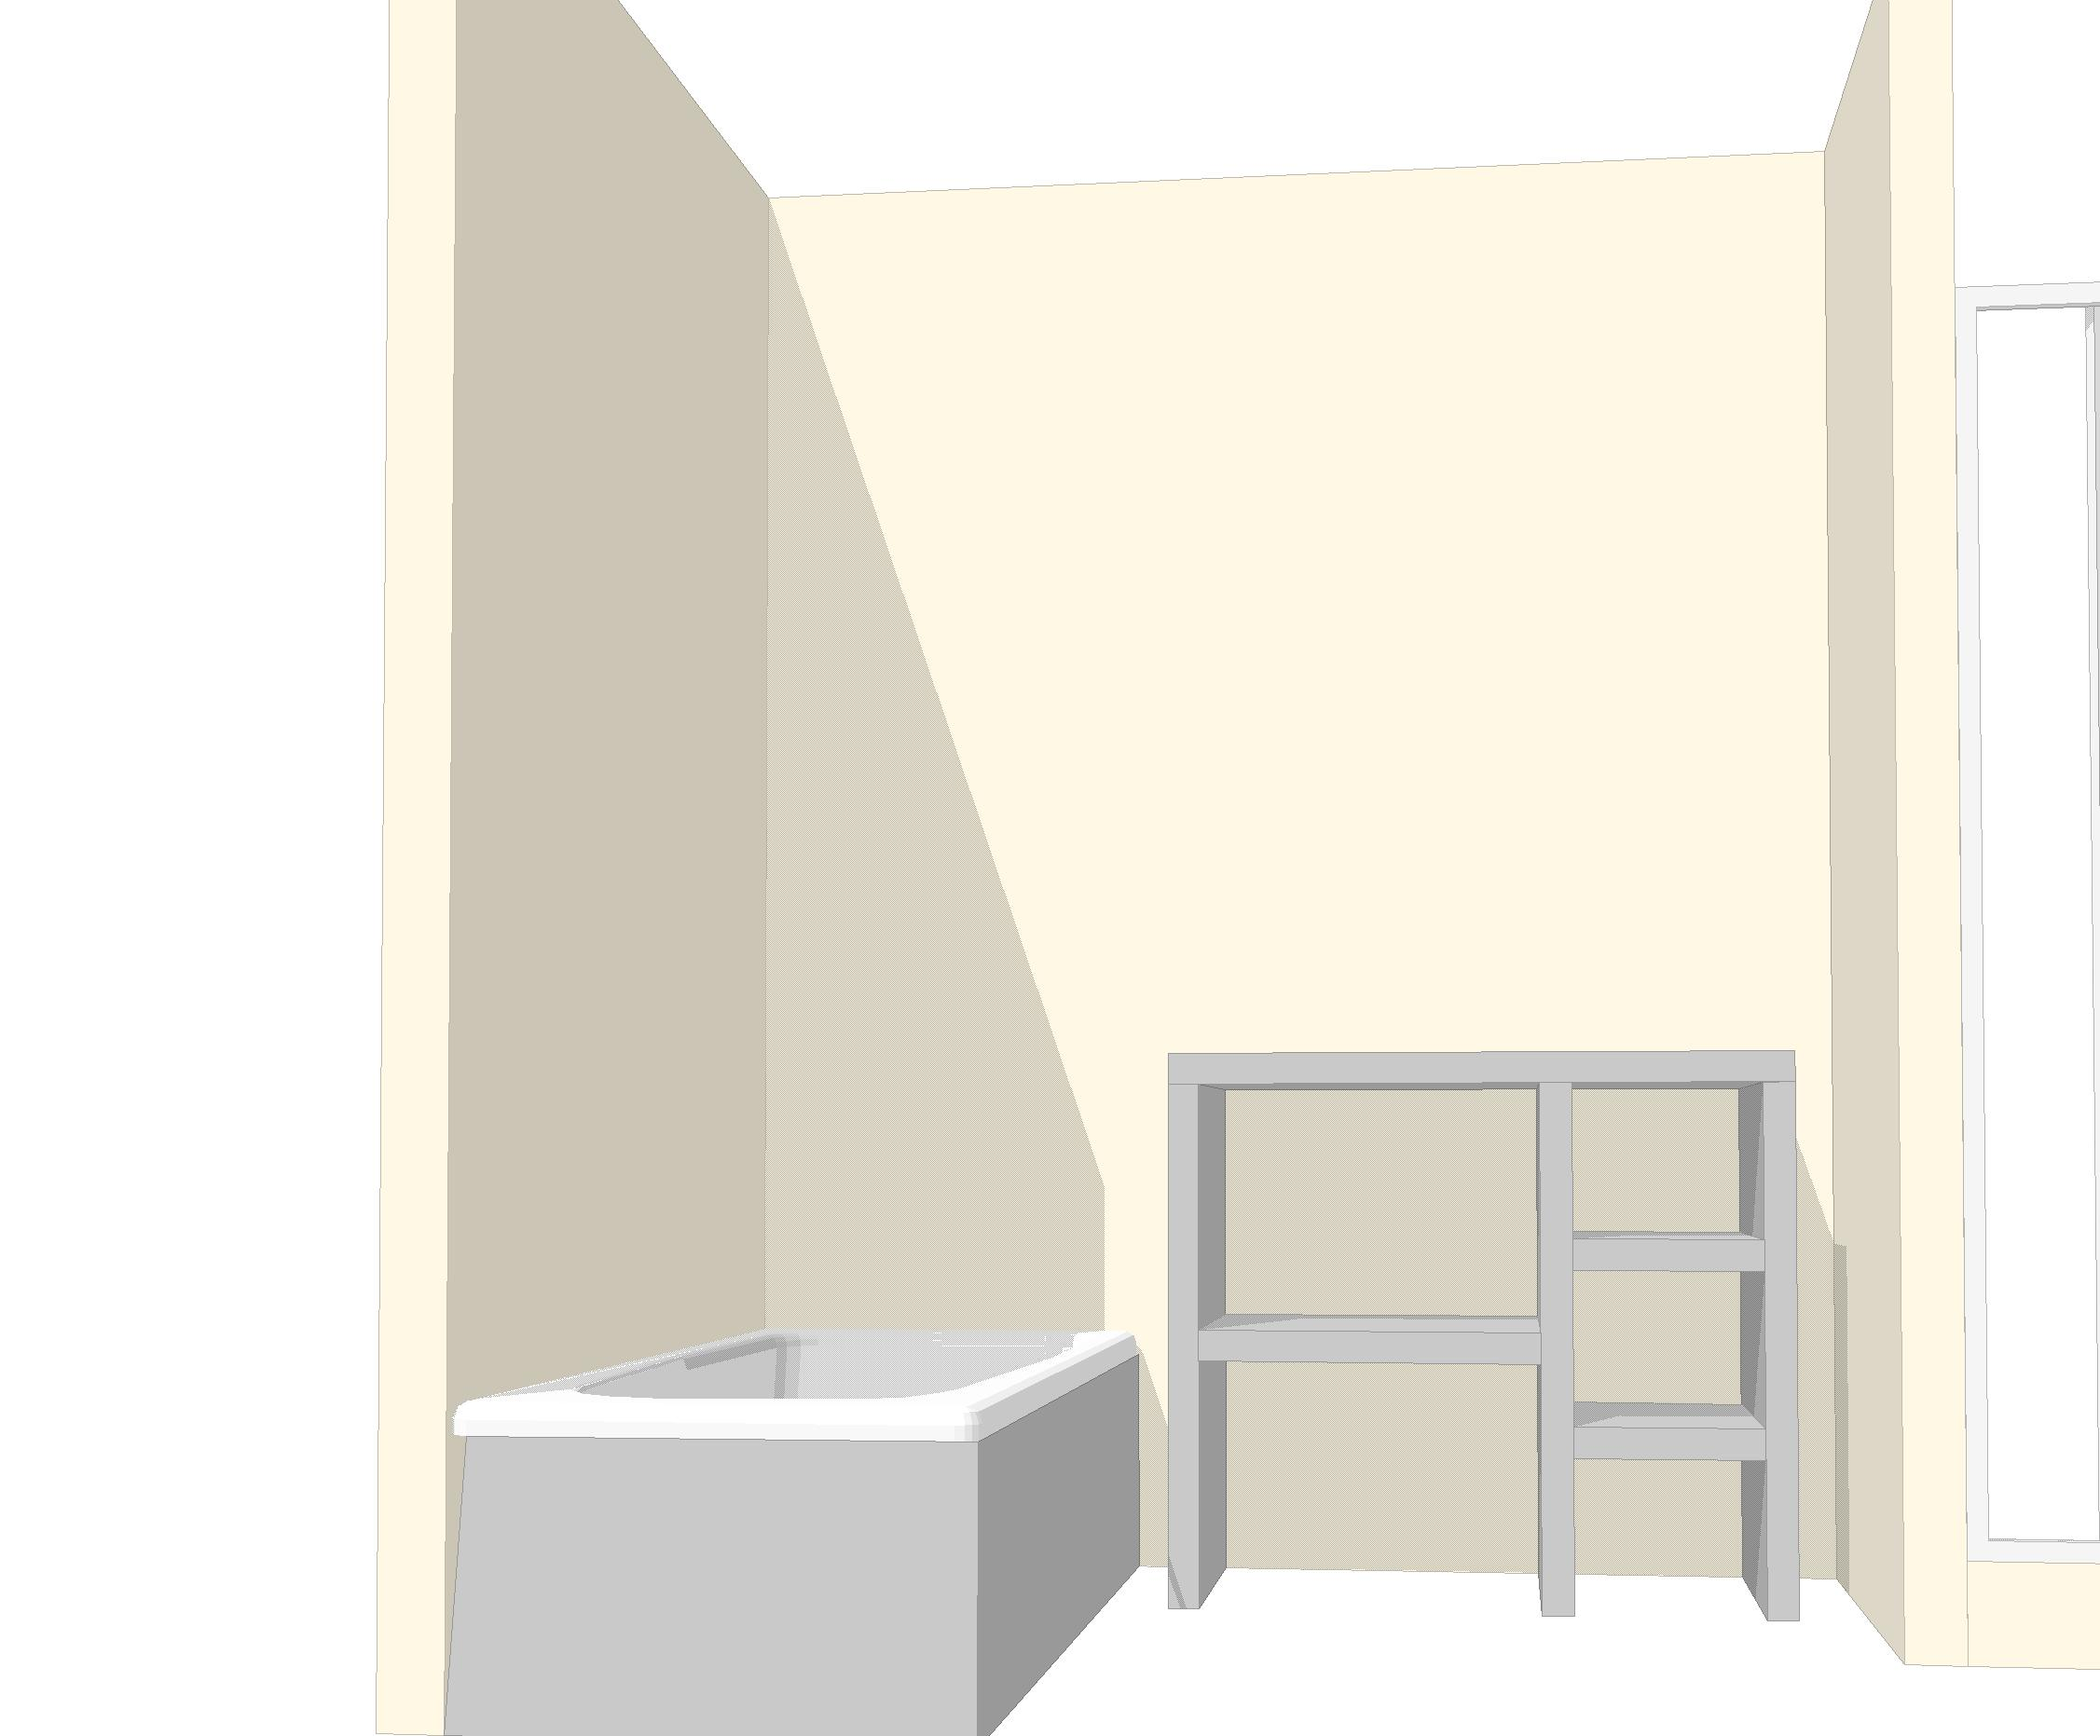 carreau de platre salle de bain id es de. Black Bedroom Furniture Sets. Home Design Ideas